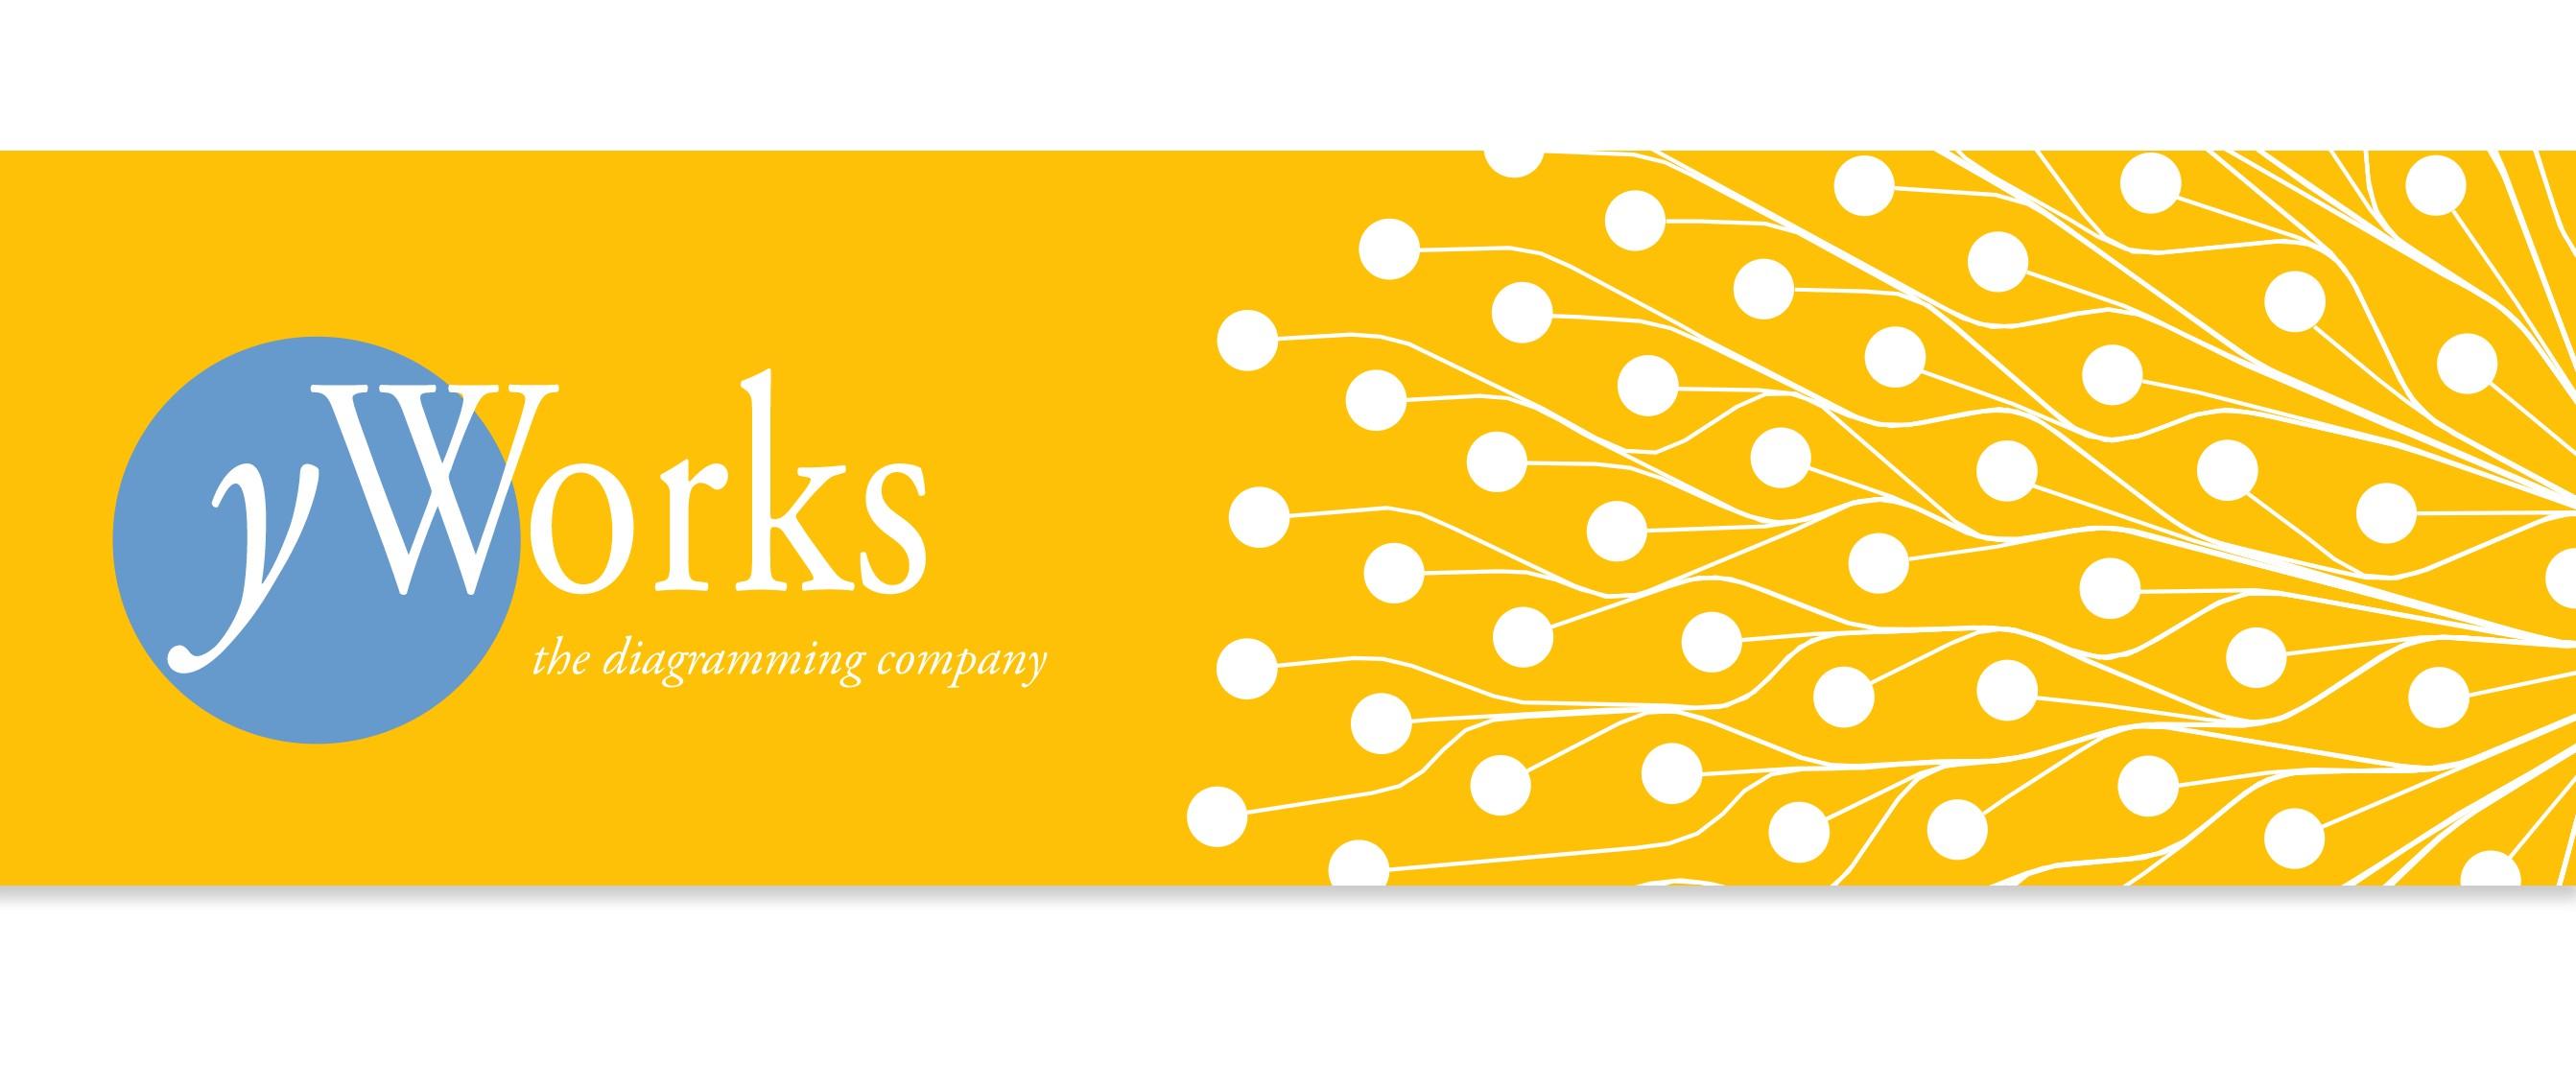 yWorks GmbH | LinkedIn